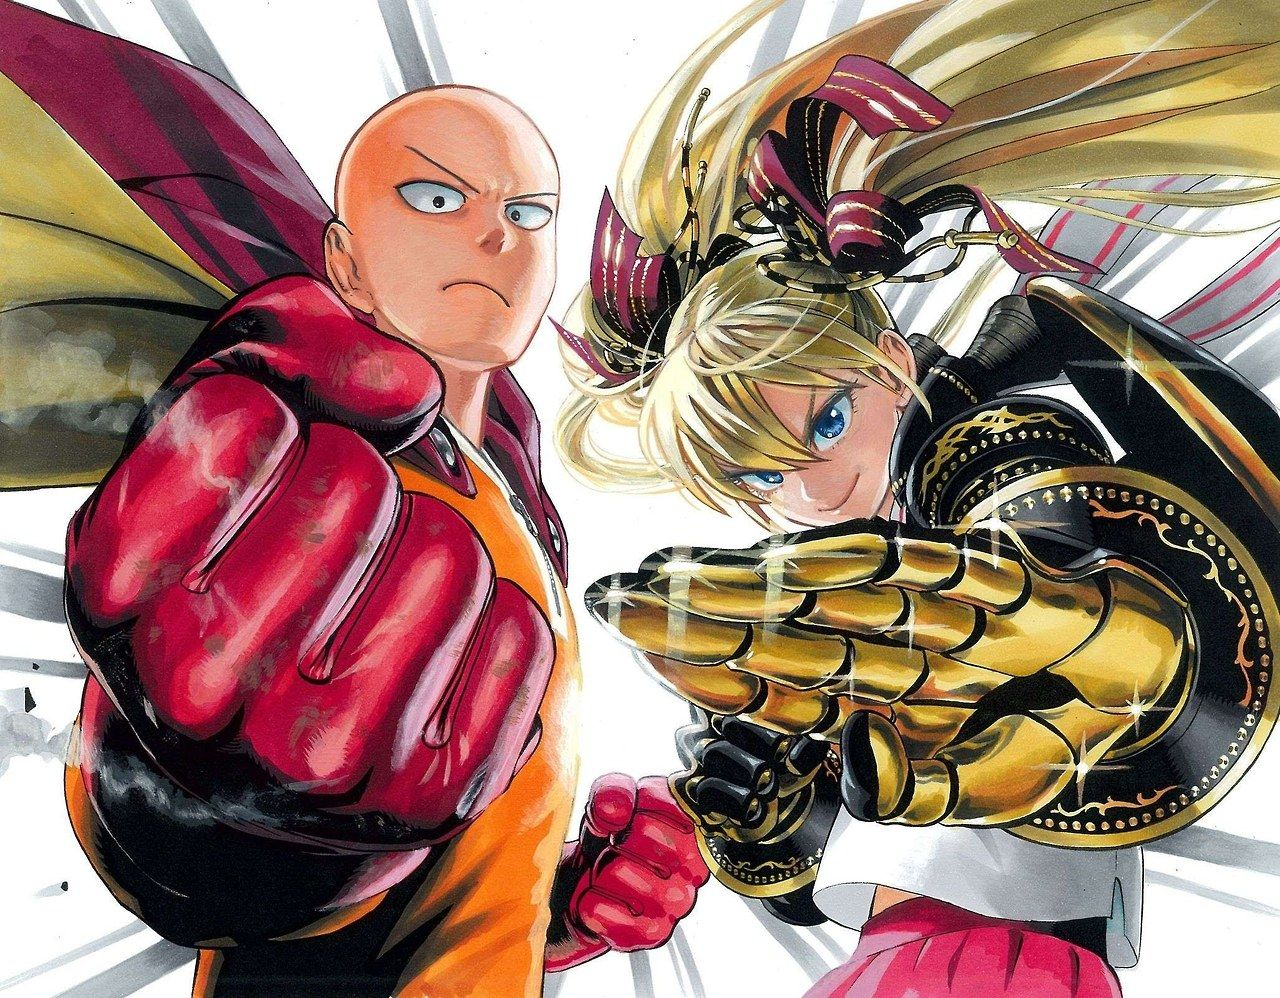 One Punch Man One punch man anime, Saitama one punch man